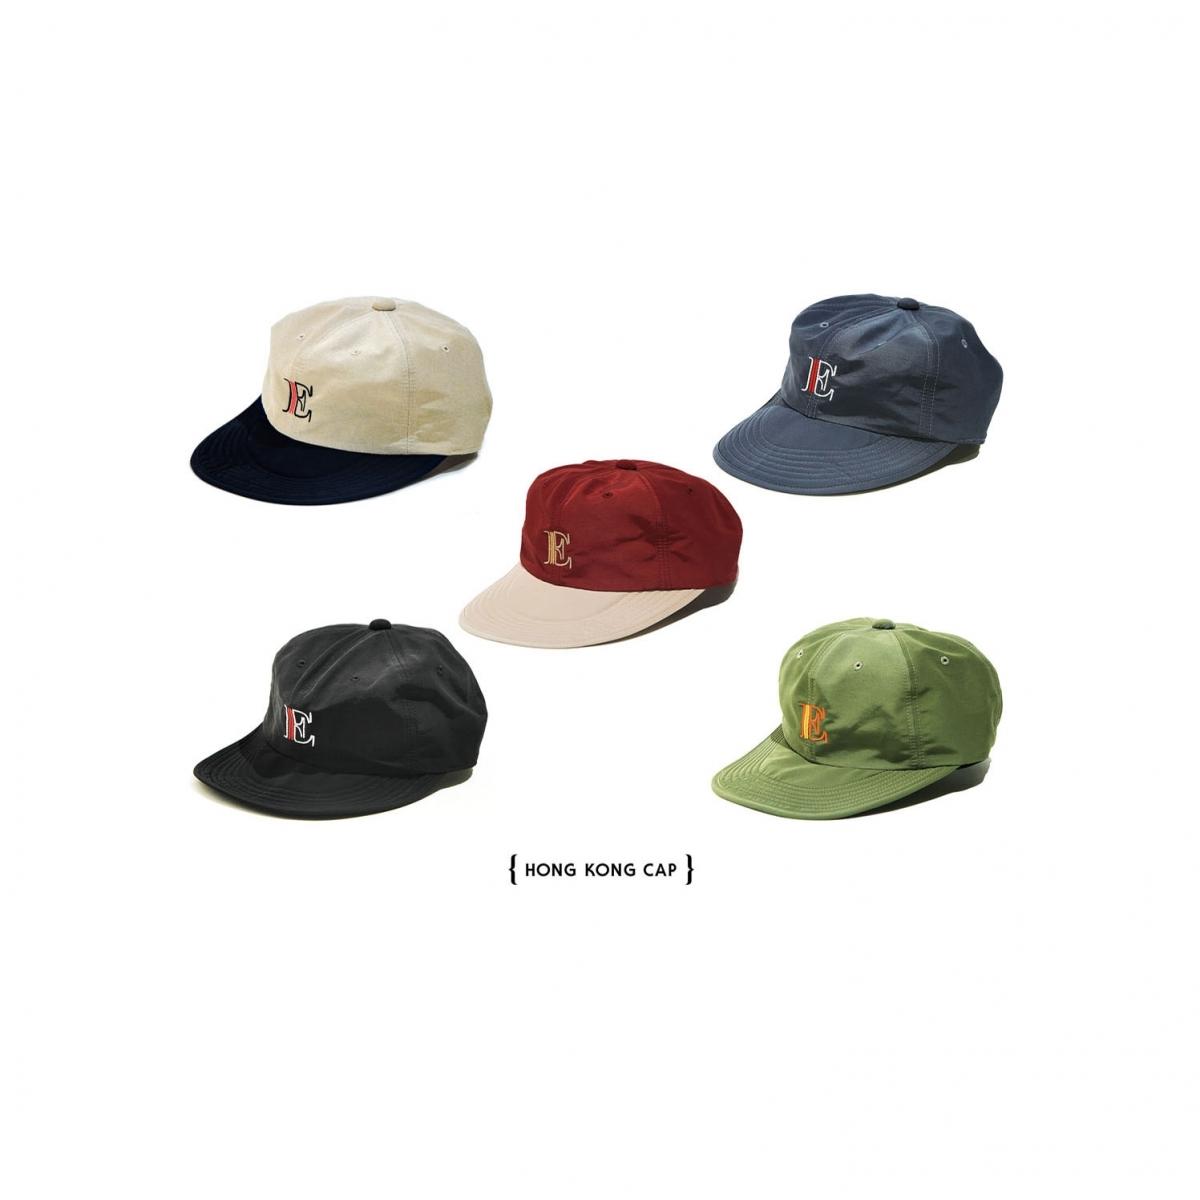 【Evisen Skateboards ゑ】HONG KONG CAP